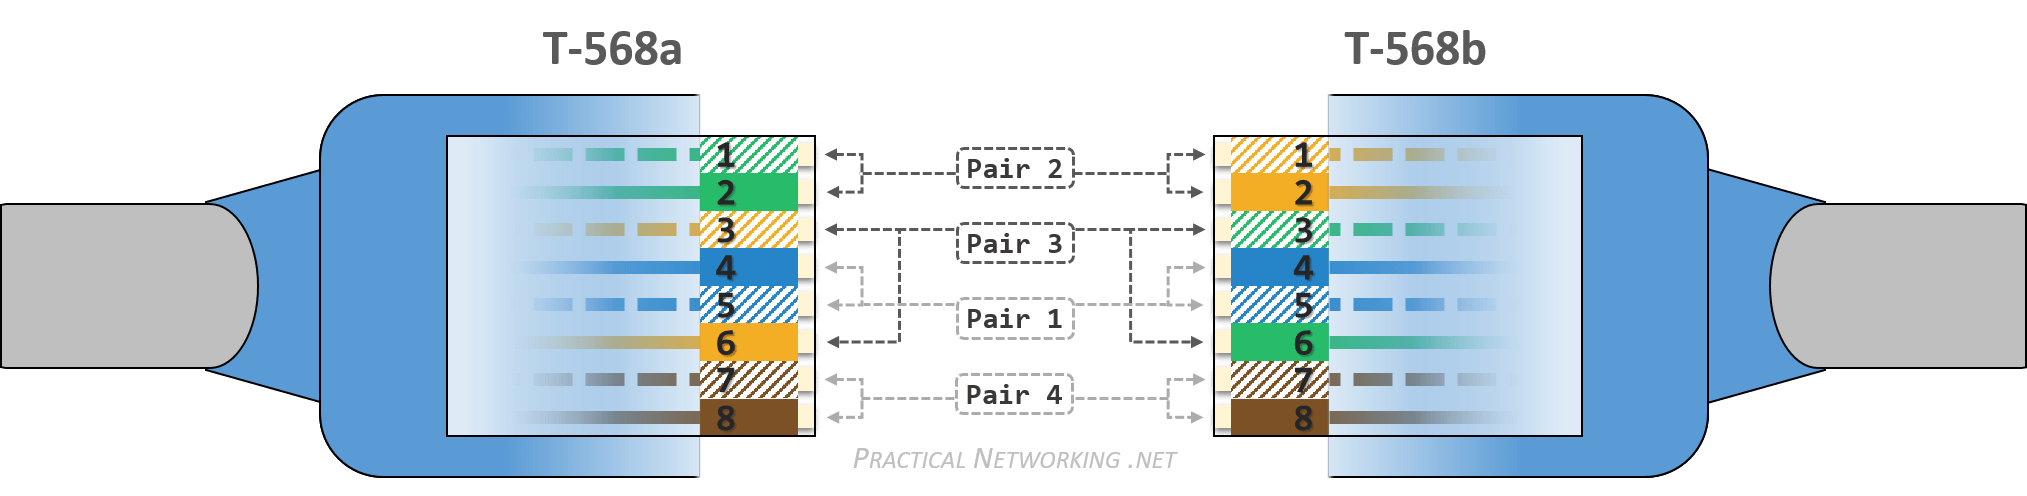 siemens len00c003120b wiring diagram   36 wiring diagram